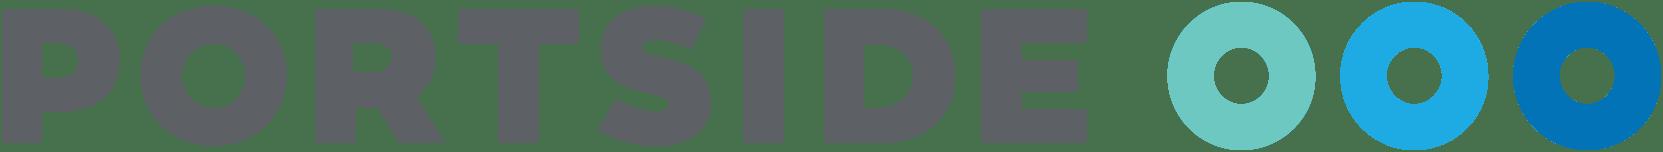 Portside logo